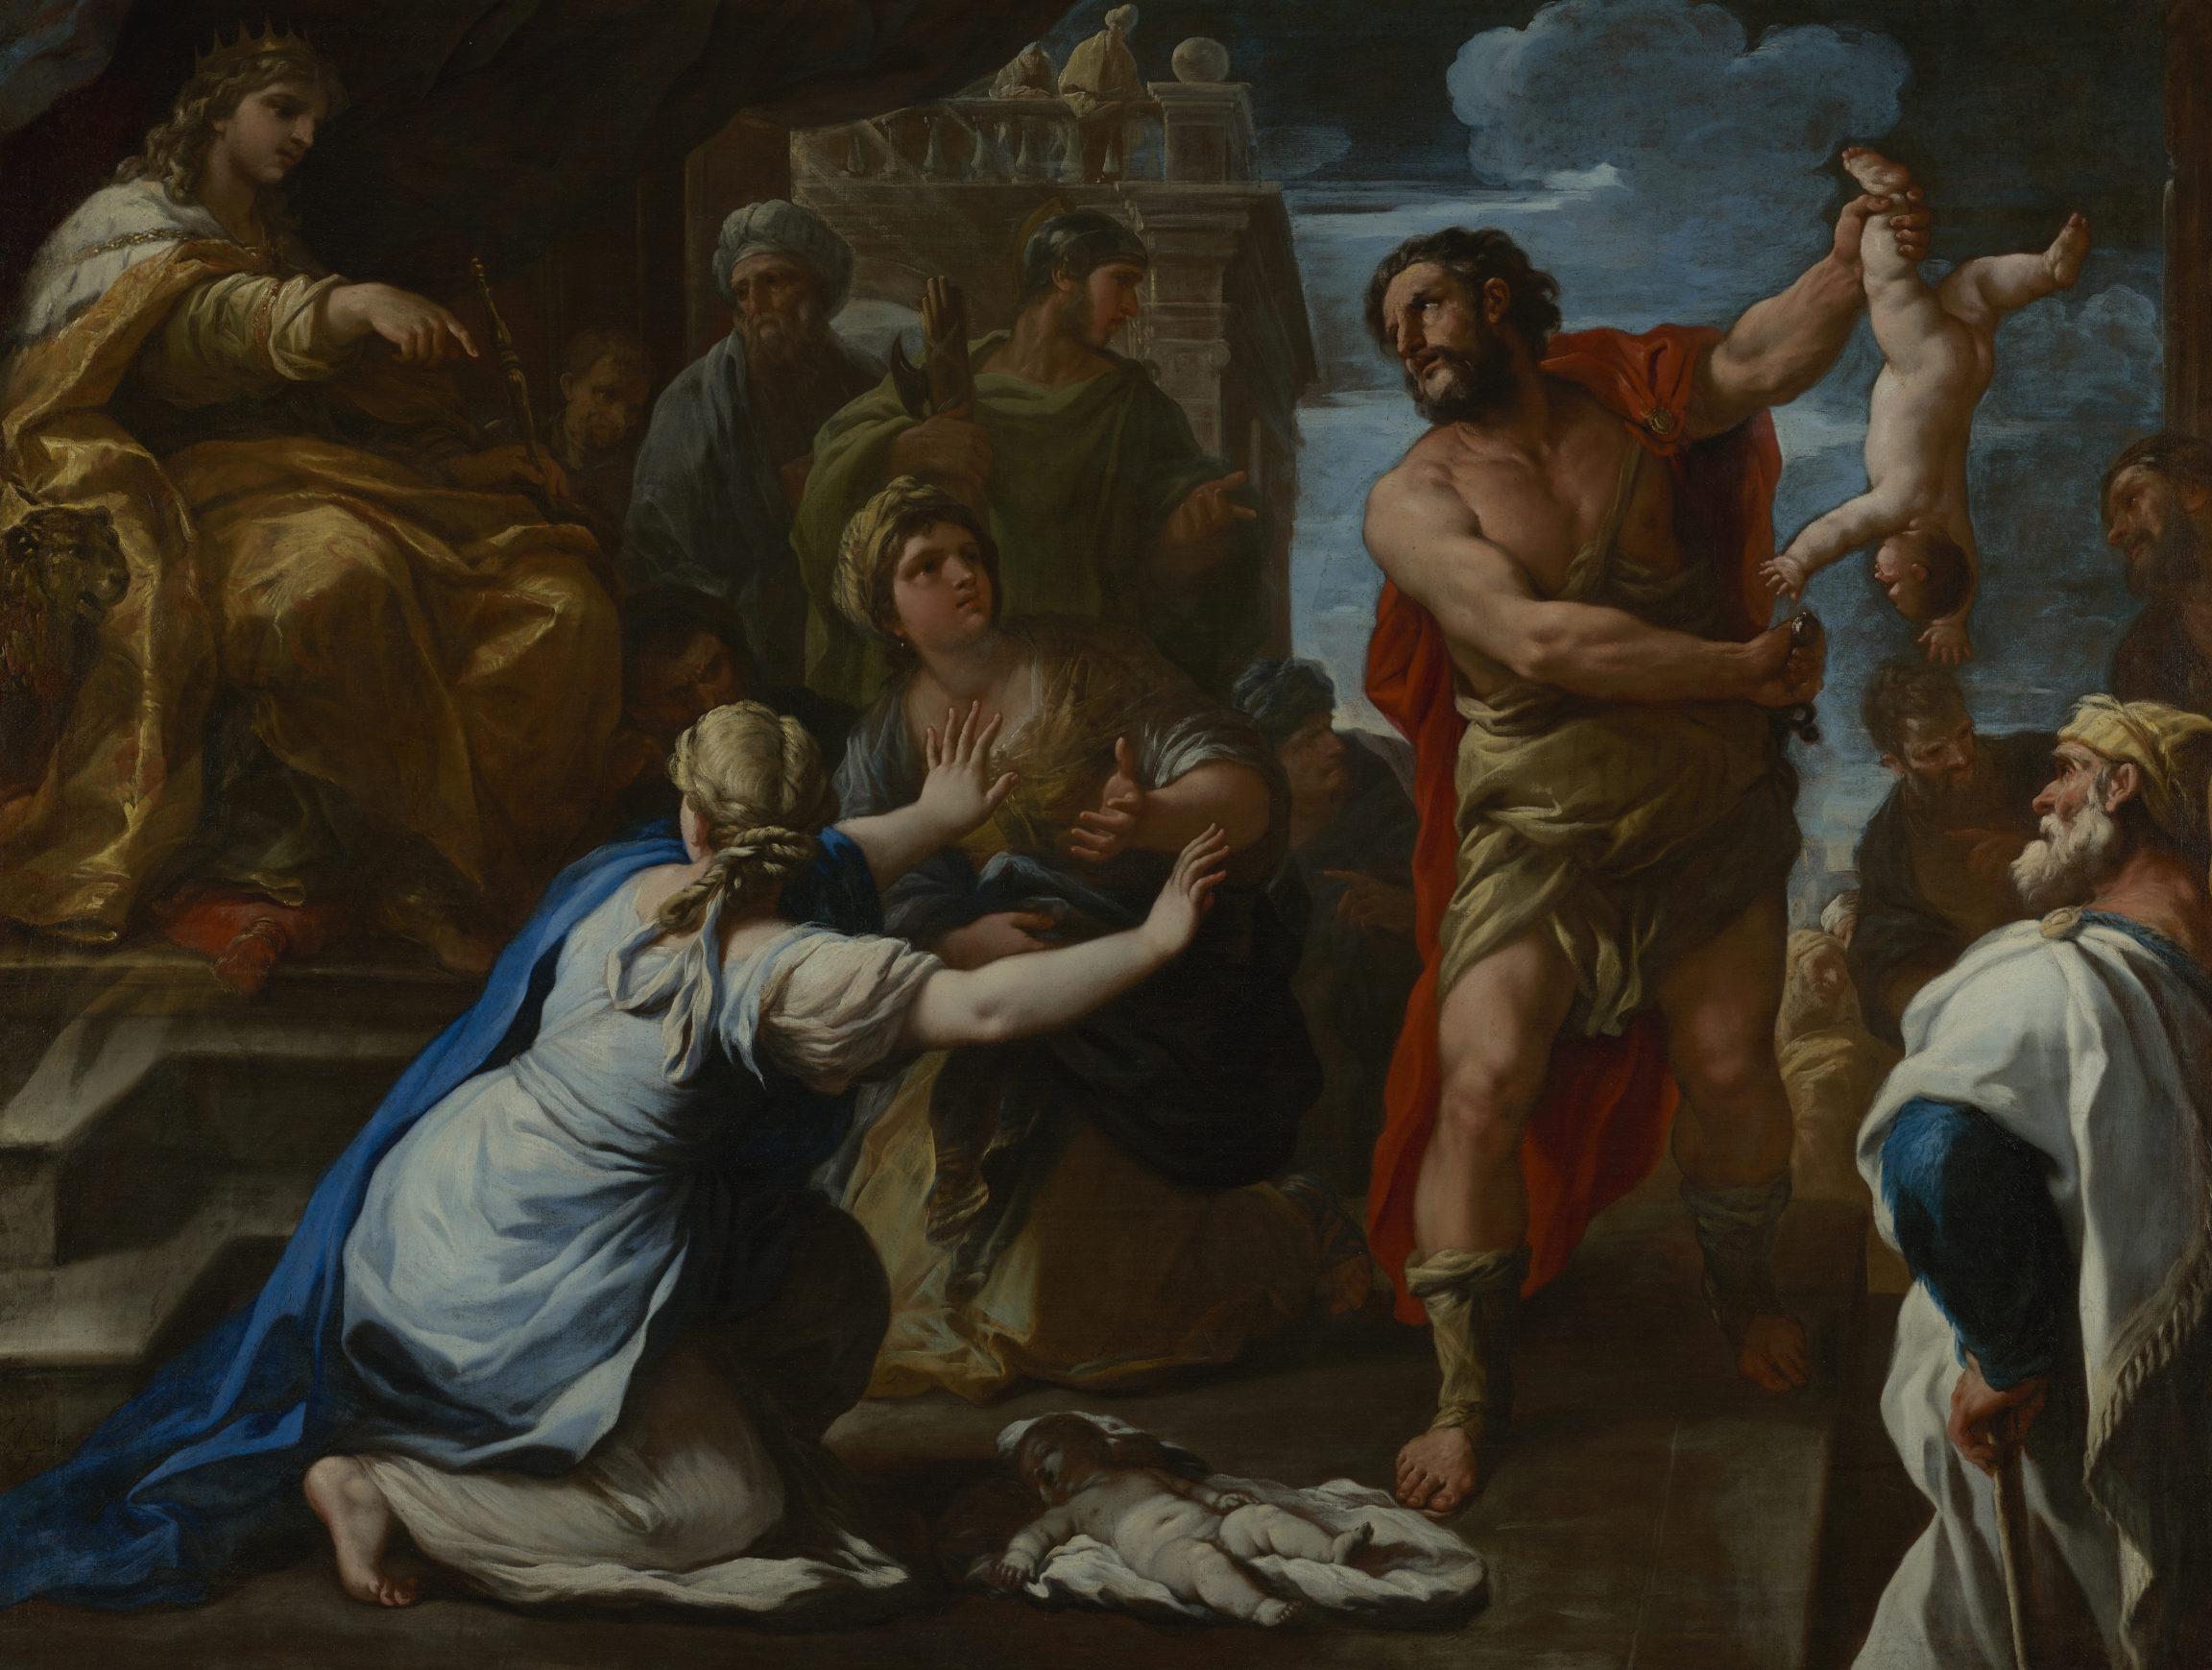 Luca Giordano , Le jugement de Salomon (The Judgement of Solomon), c. 1670–85